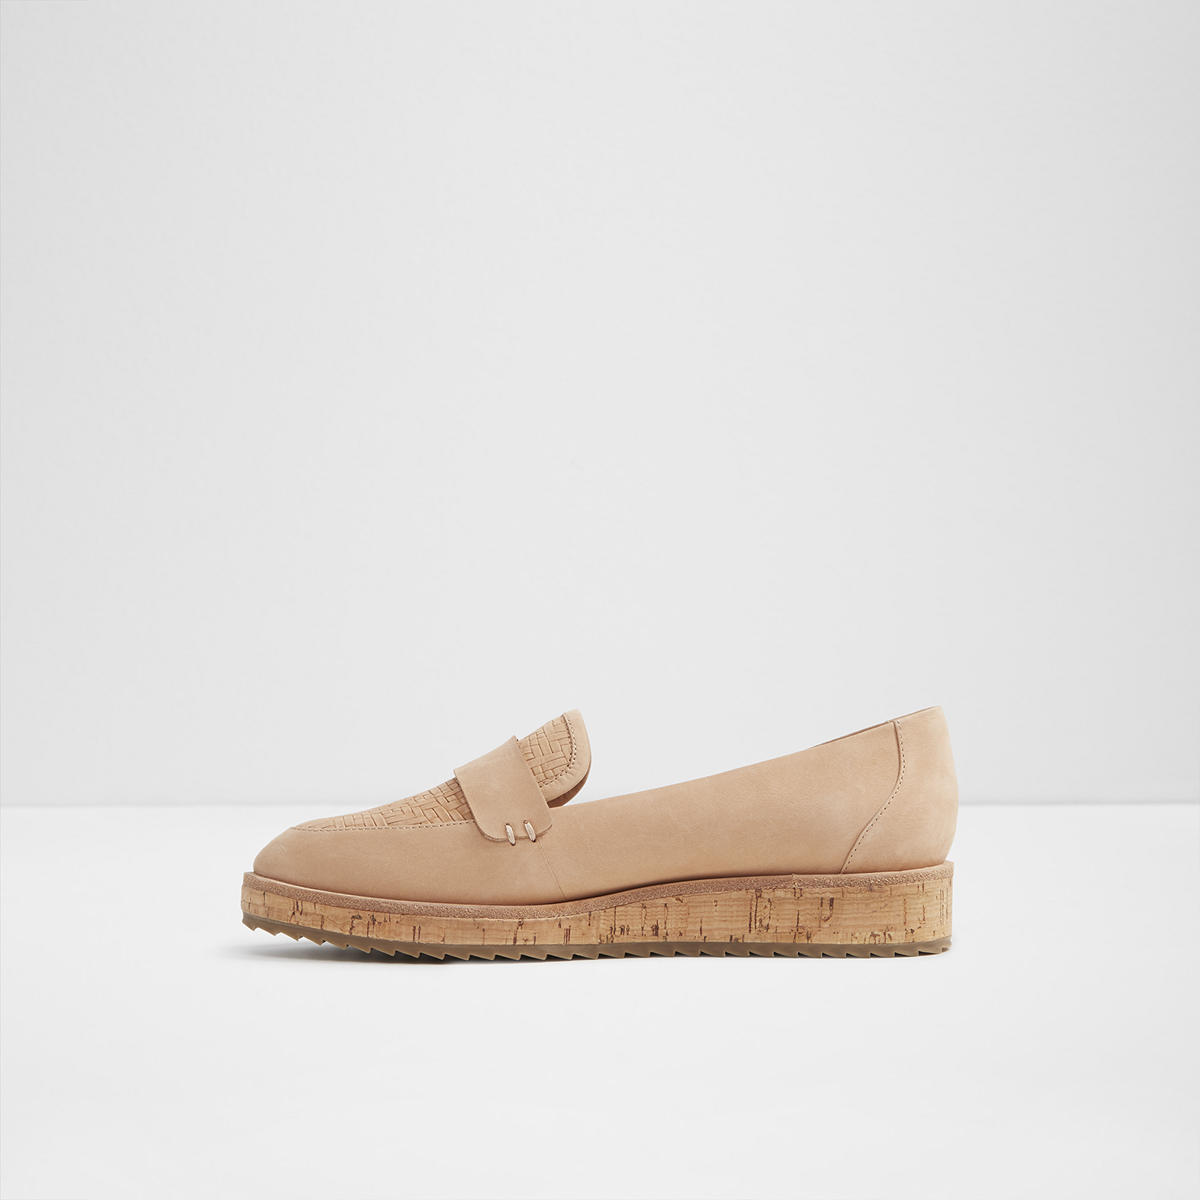 aldo shoes uncomfortableness def